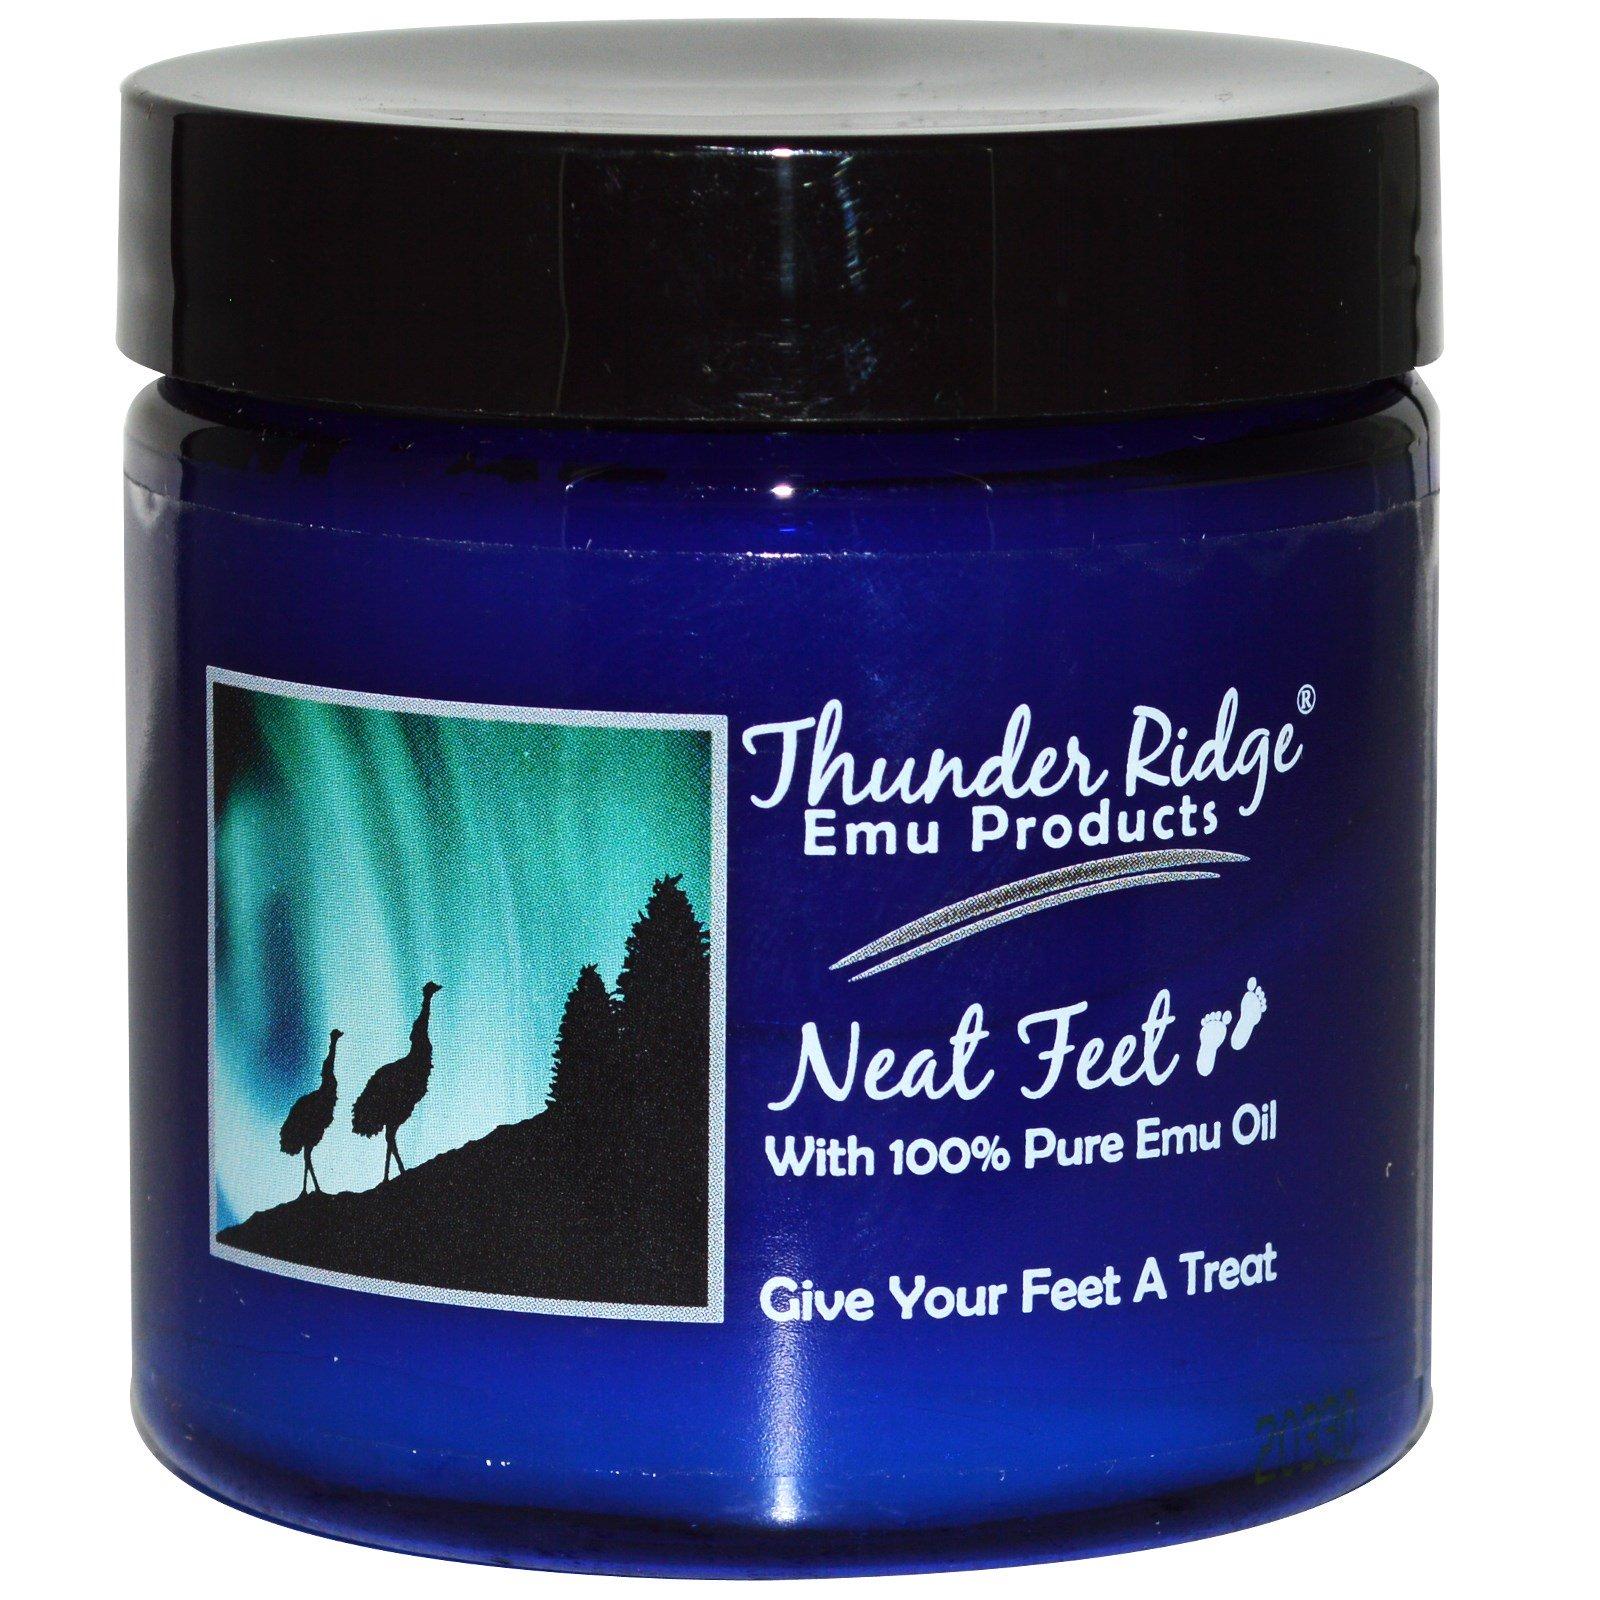 Thunder Ridge Emu Products, Красивые ноги (Neat Feet), 4 унции (113,6 г)